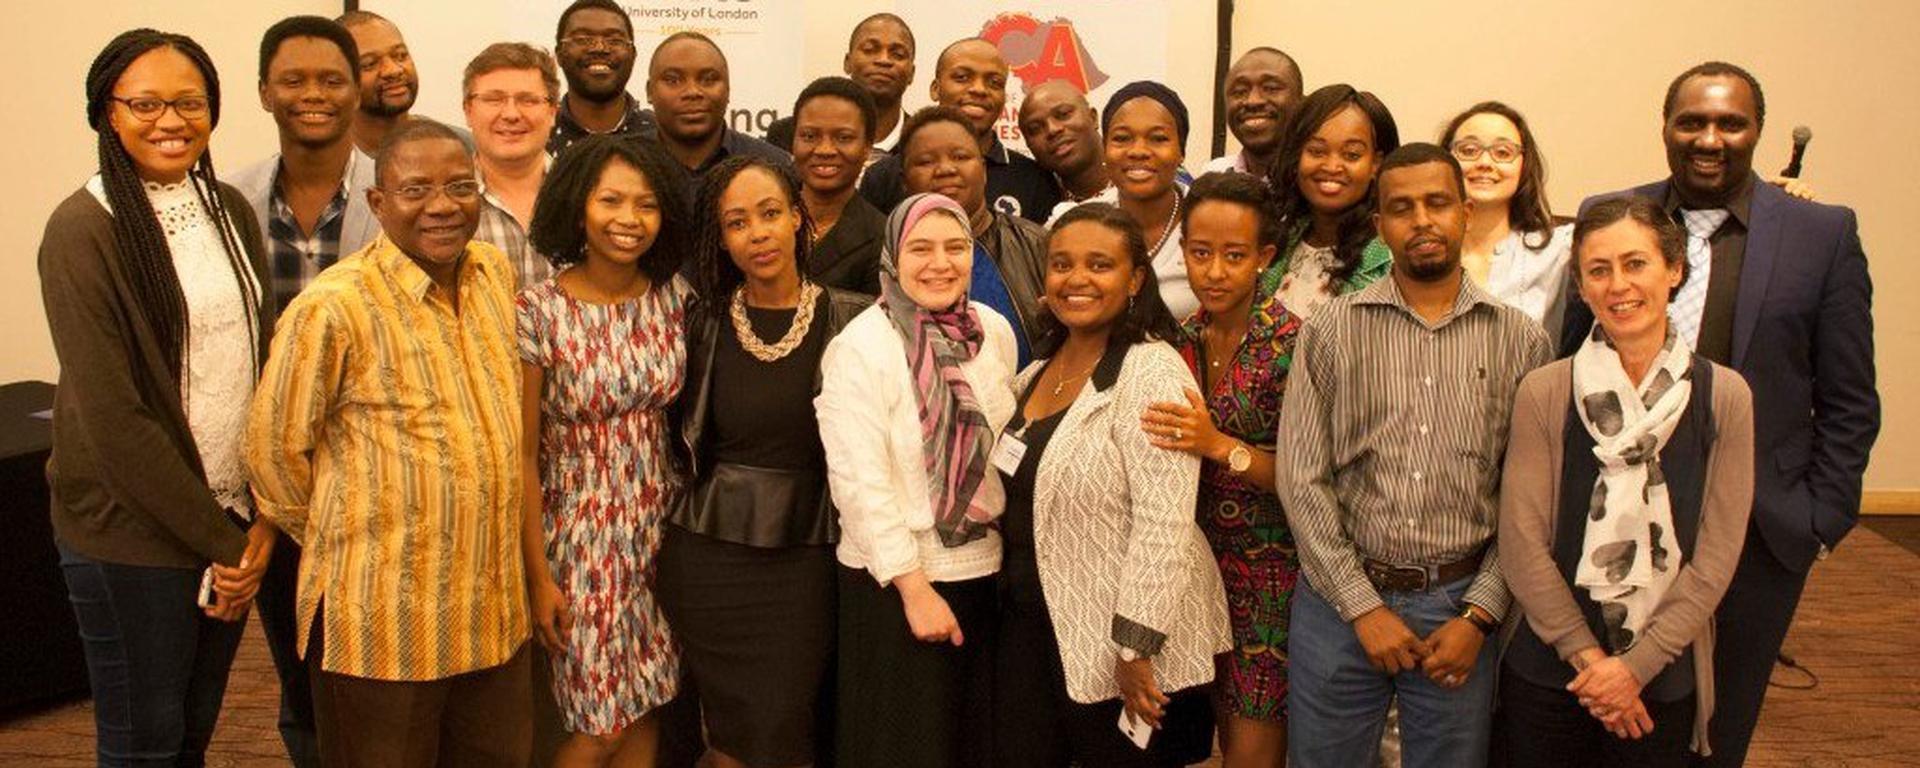 Mo Ibrahim Foundation - The Ibrahim Leadership Fellowship Movemeback African initiative cover image